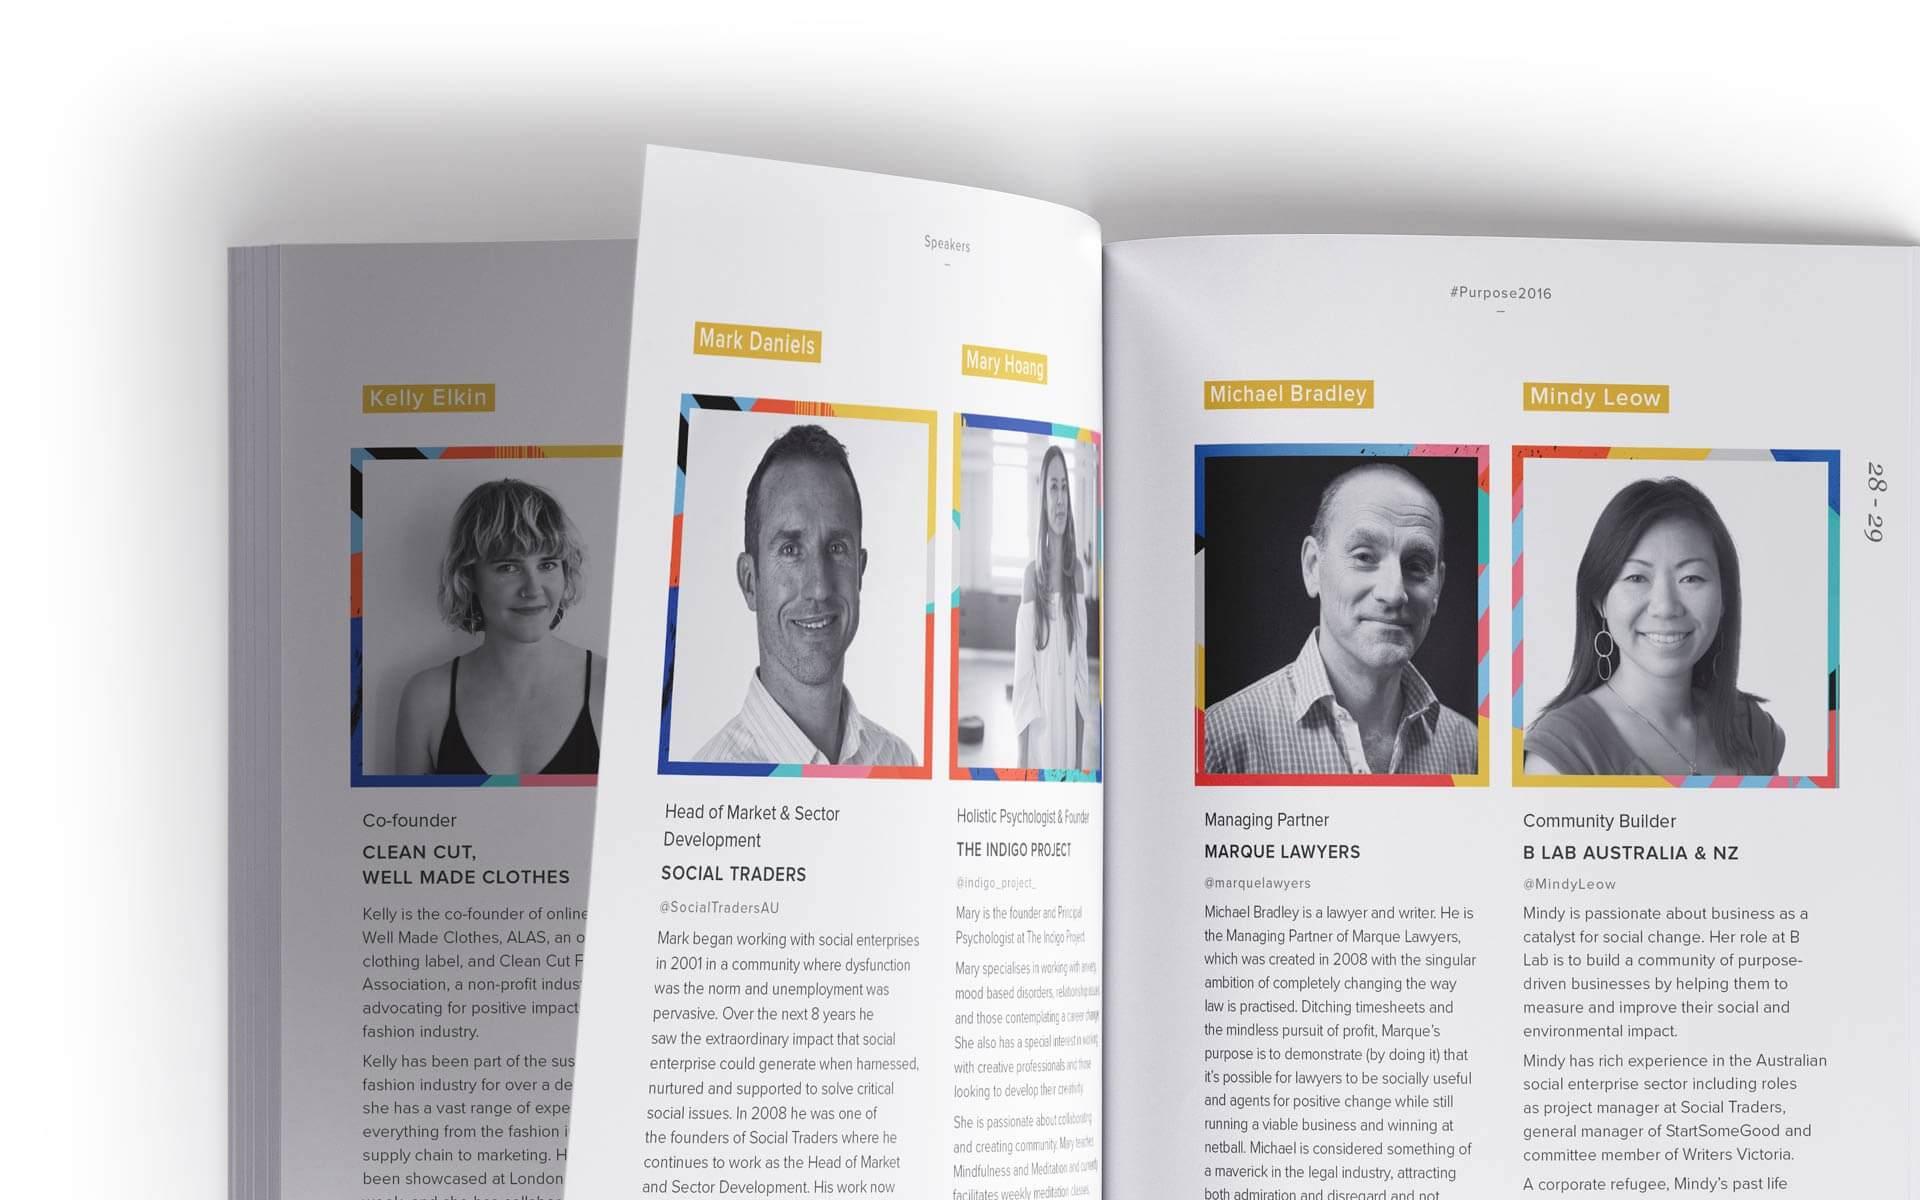 Purpose 2016 program speakers spreads